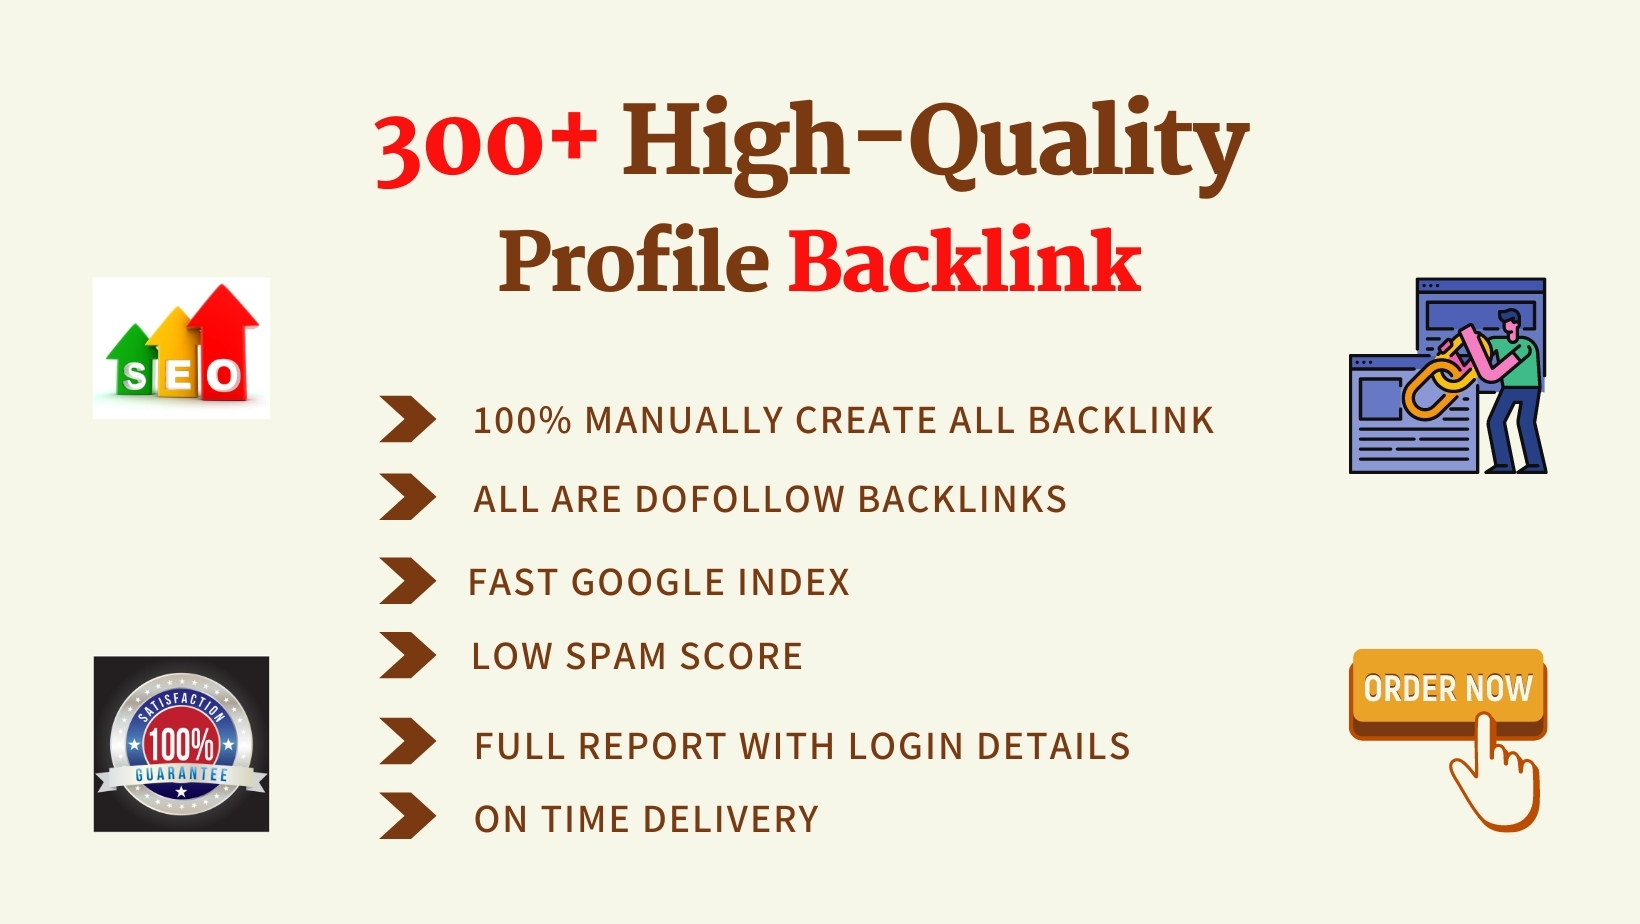 I will create 50 high profile backlinks manually.